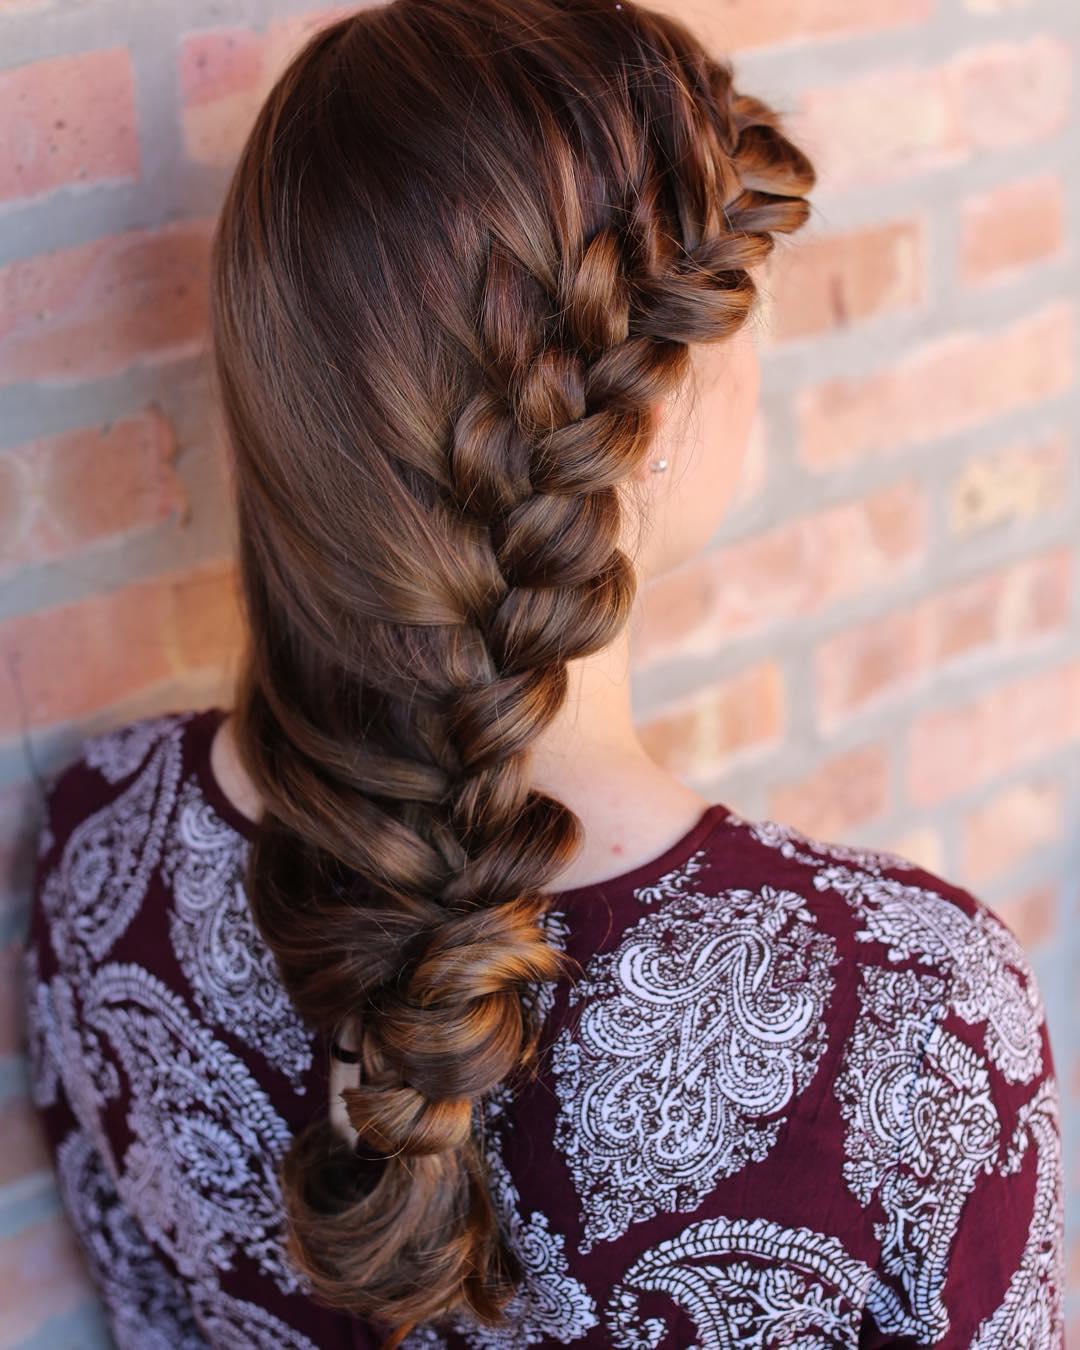 Superb Braid Hairstyle